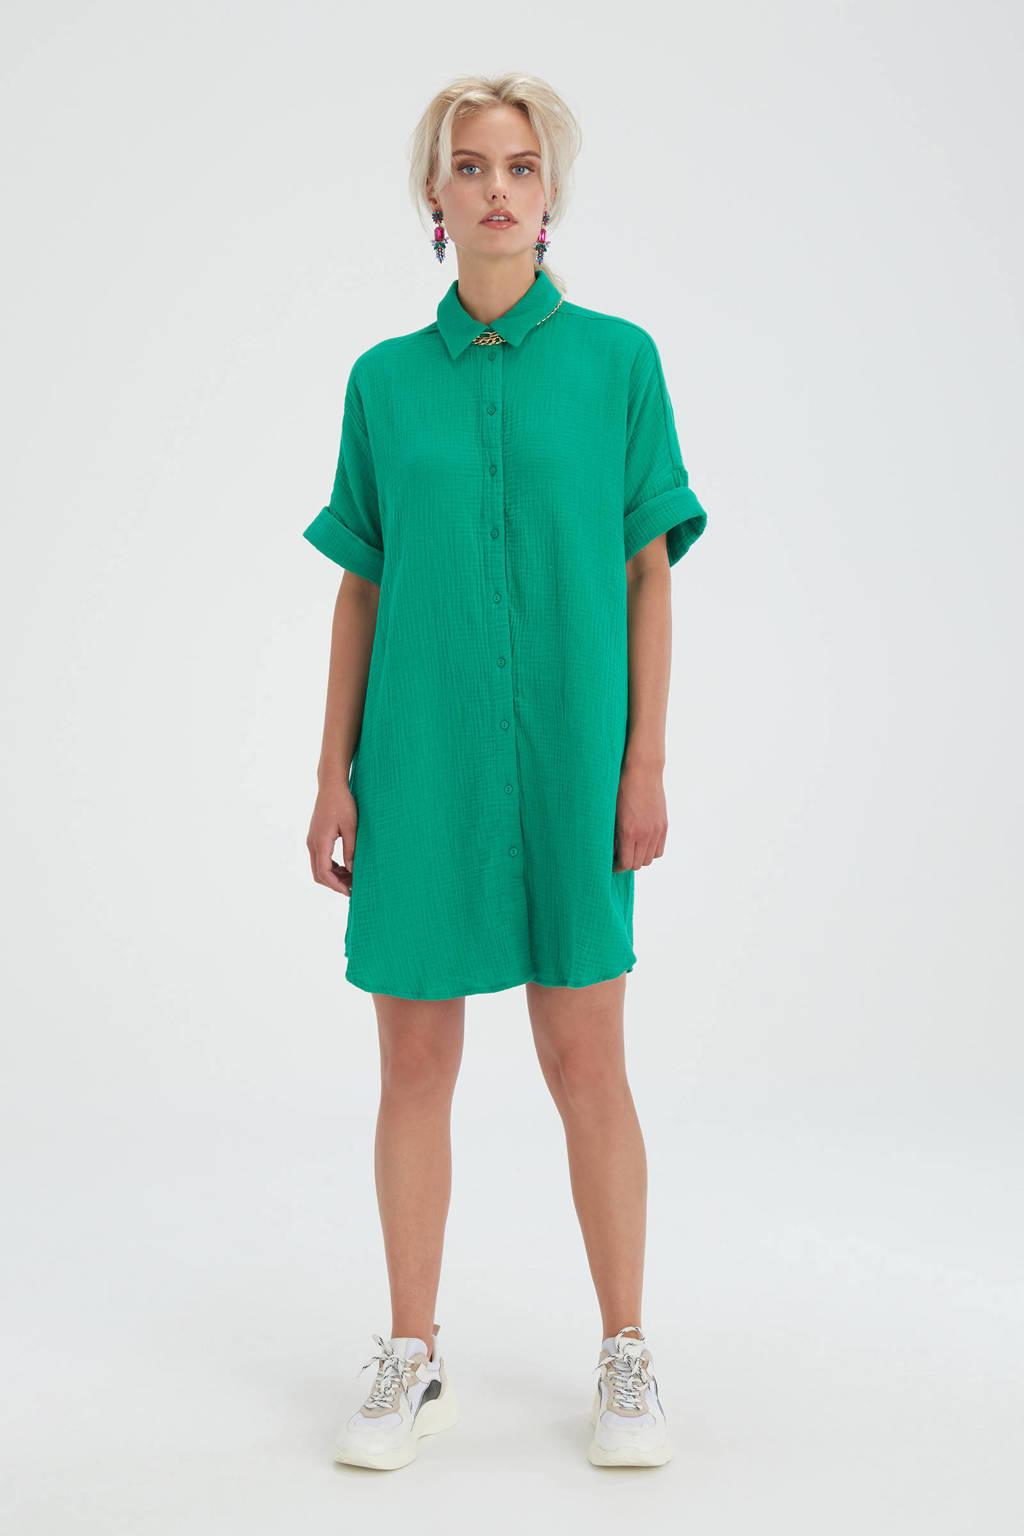 Shoeby Eksept blousejurk Cotton Blouse met textuur groen, Groen